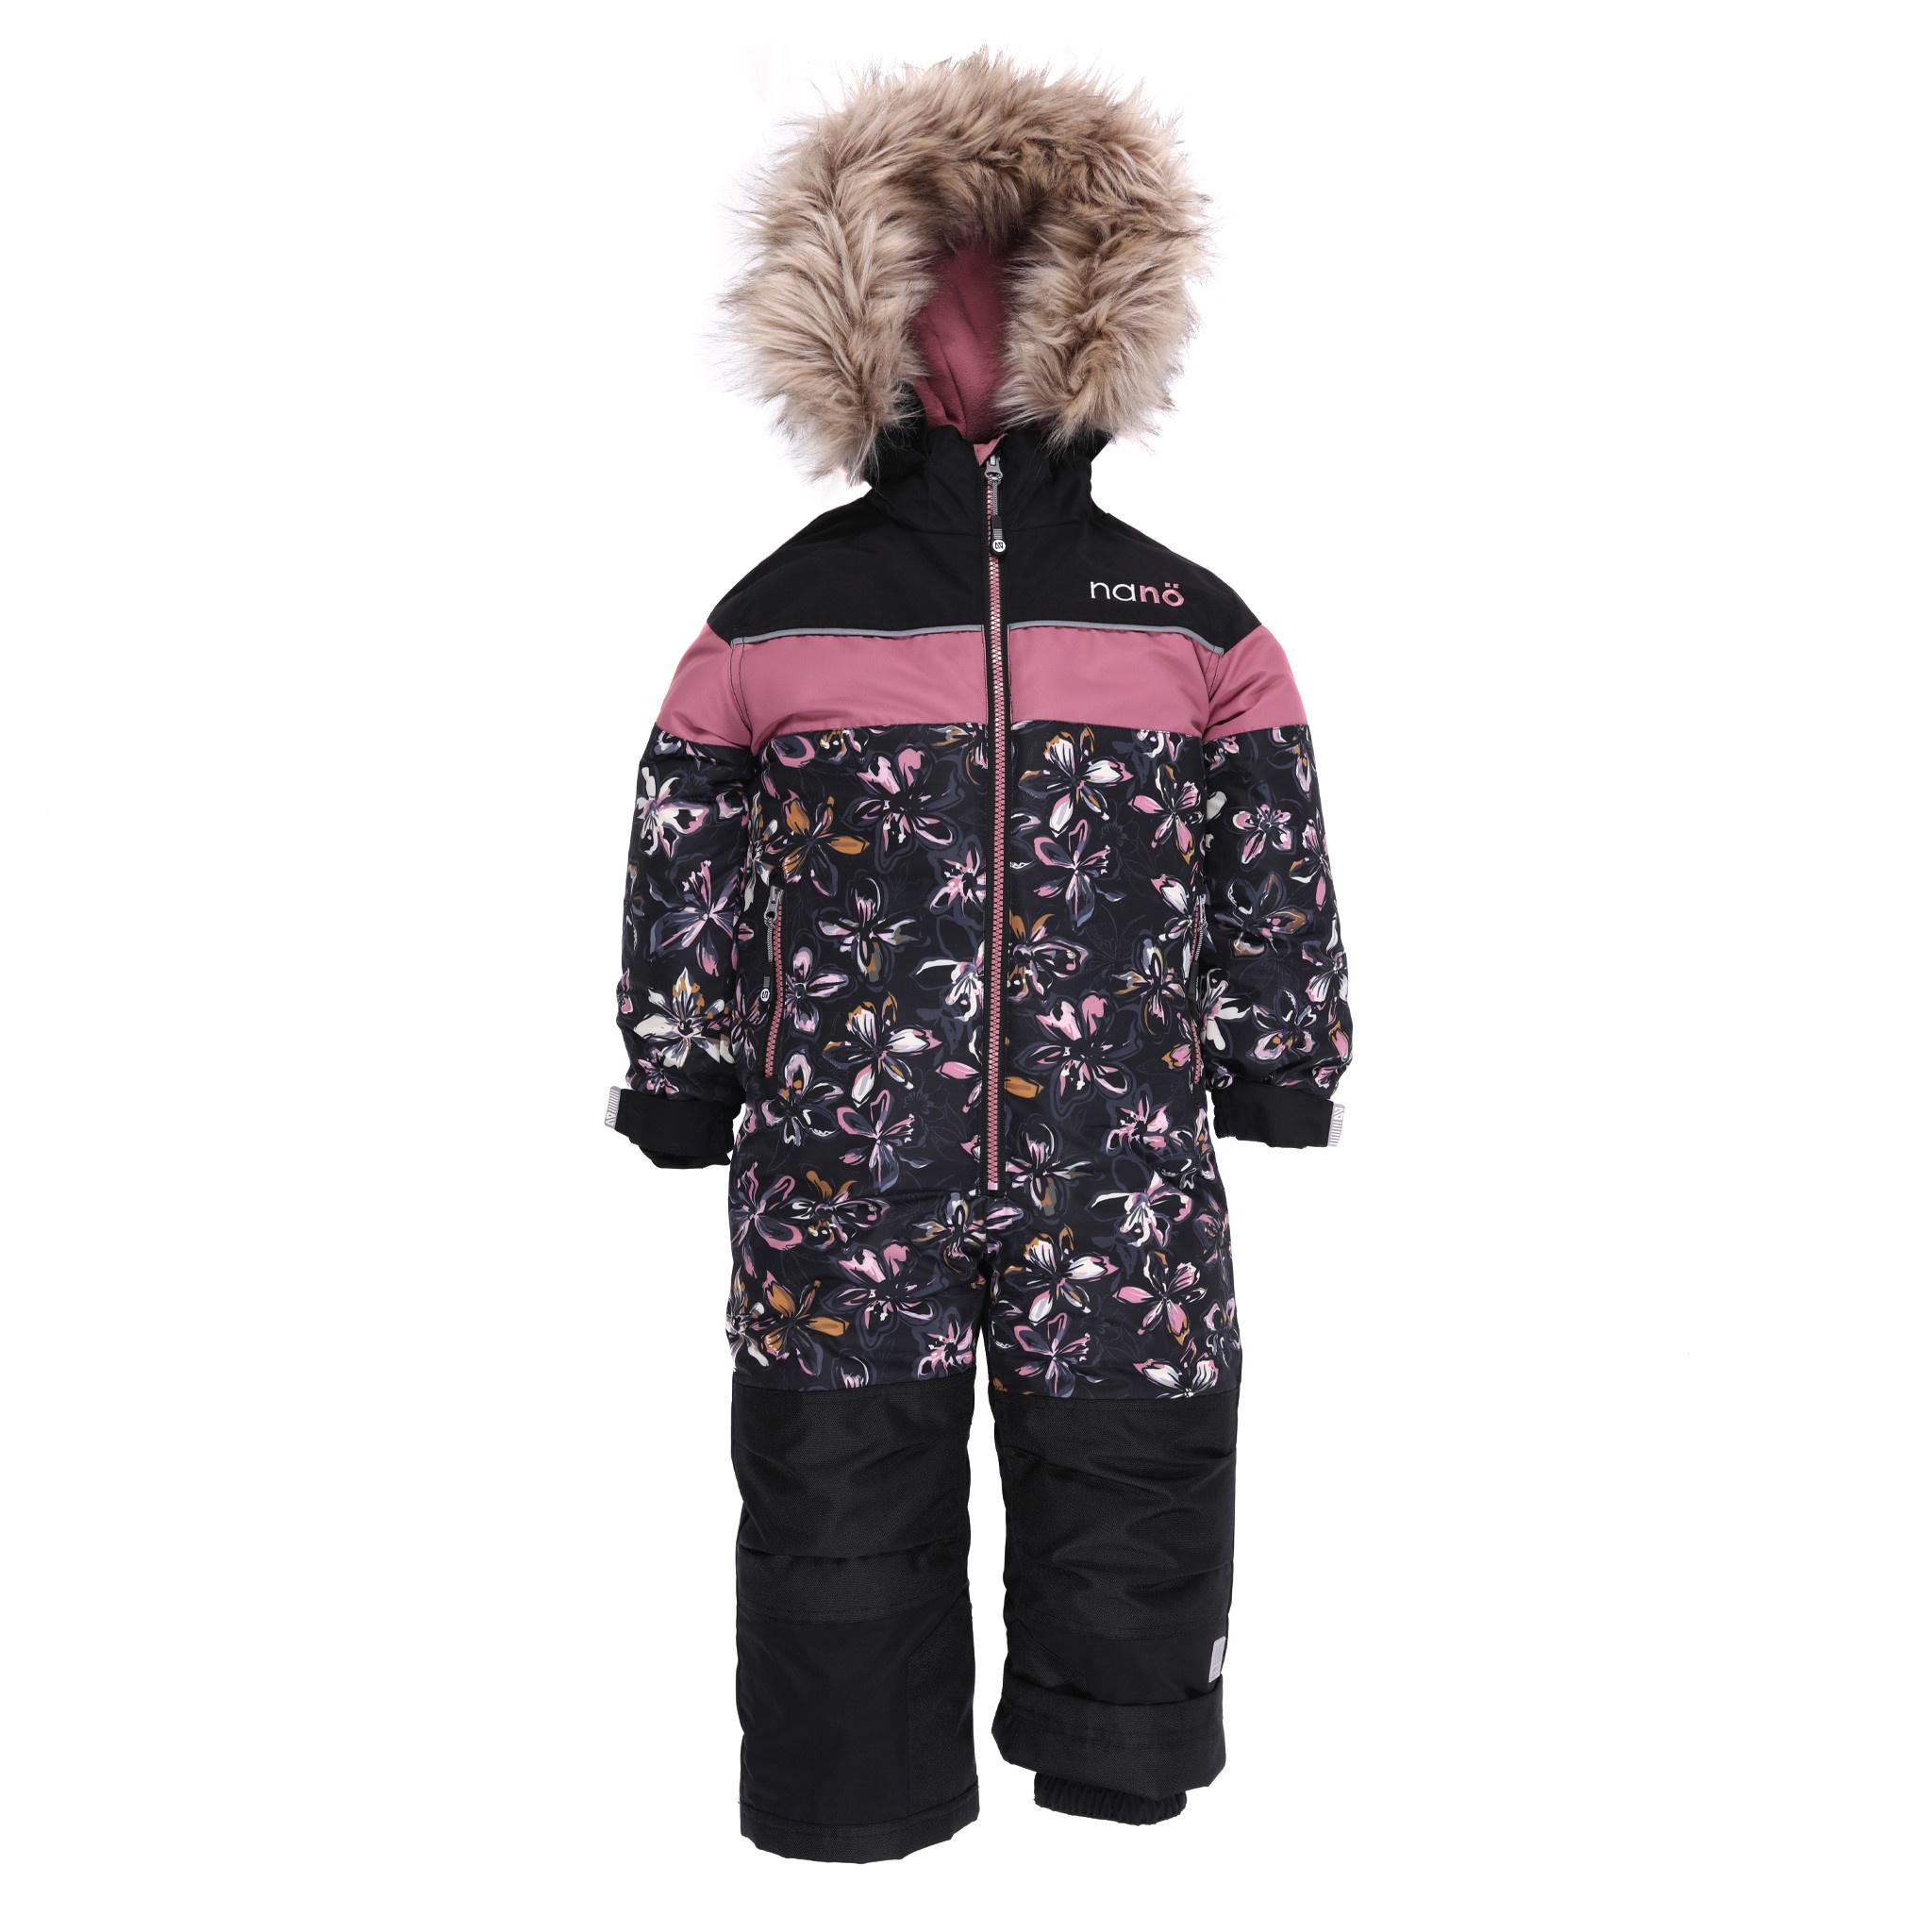 Habit de neige 1 pièce - Mont Valinouet-2